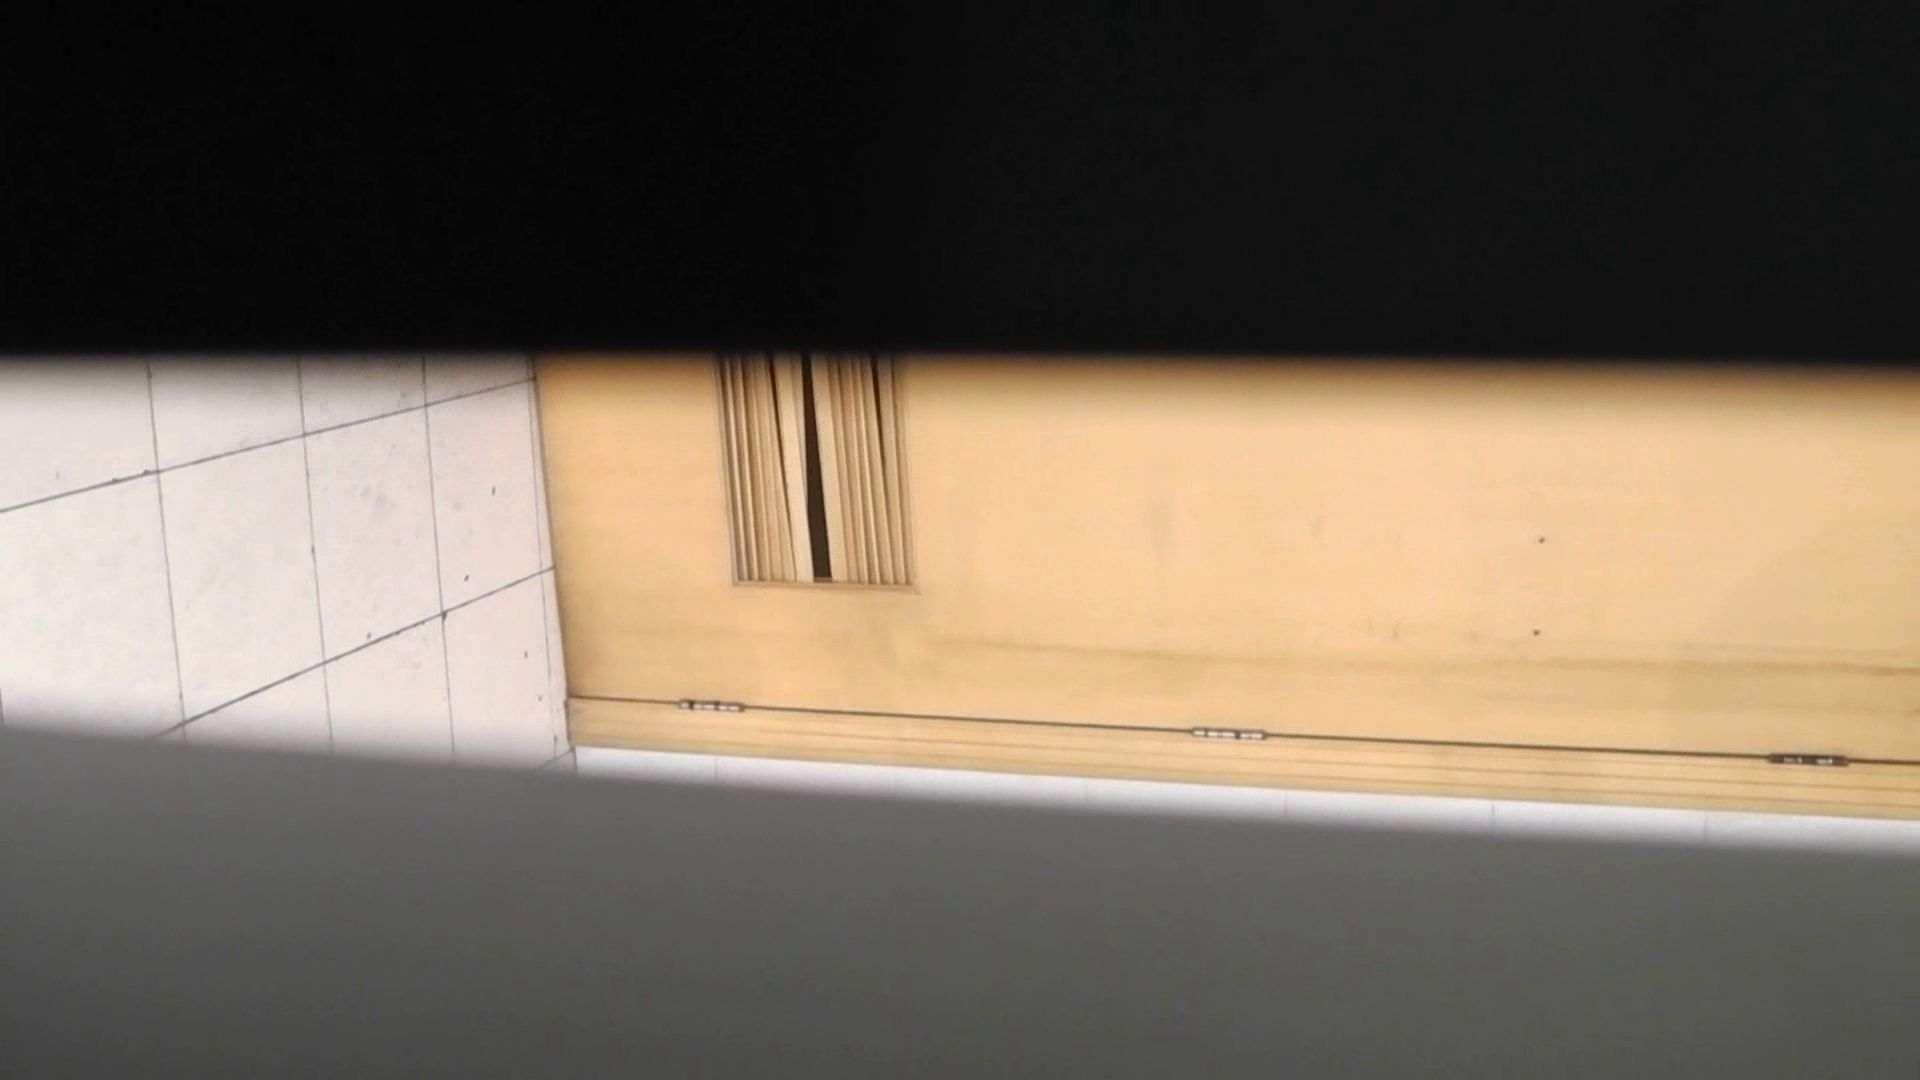 vol.24 命がけ潜伏洗面所! 三十時間潜り、一つしか出会えない完璧桃尻編 洗面所 覗きワレメ動画紹介 94pic 35